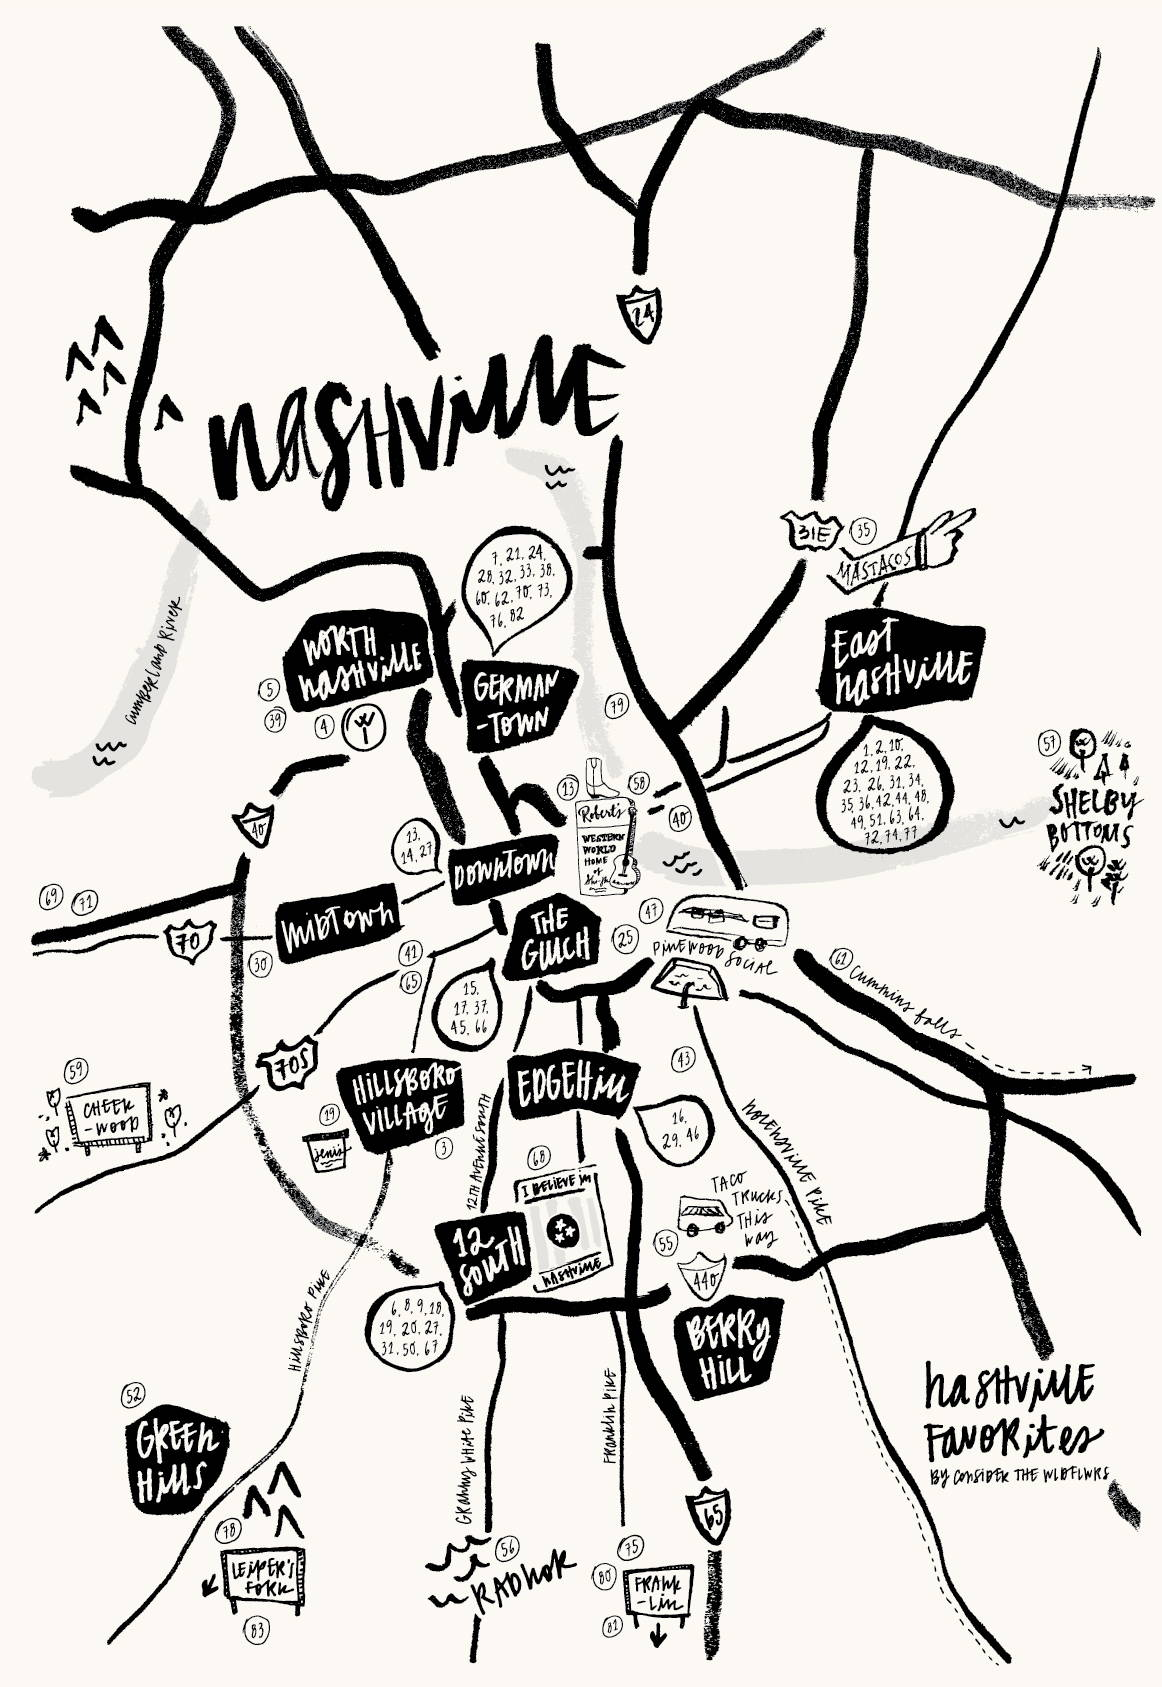 CTWF Nashville Favorites Map